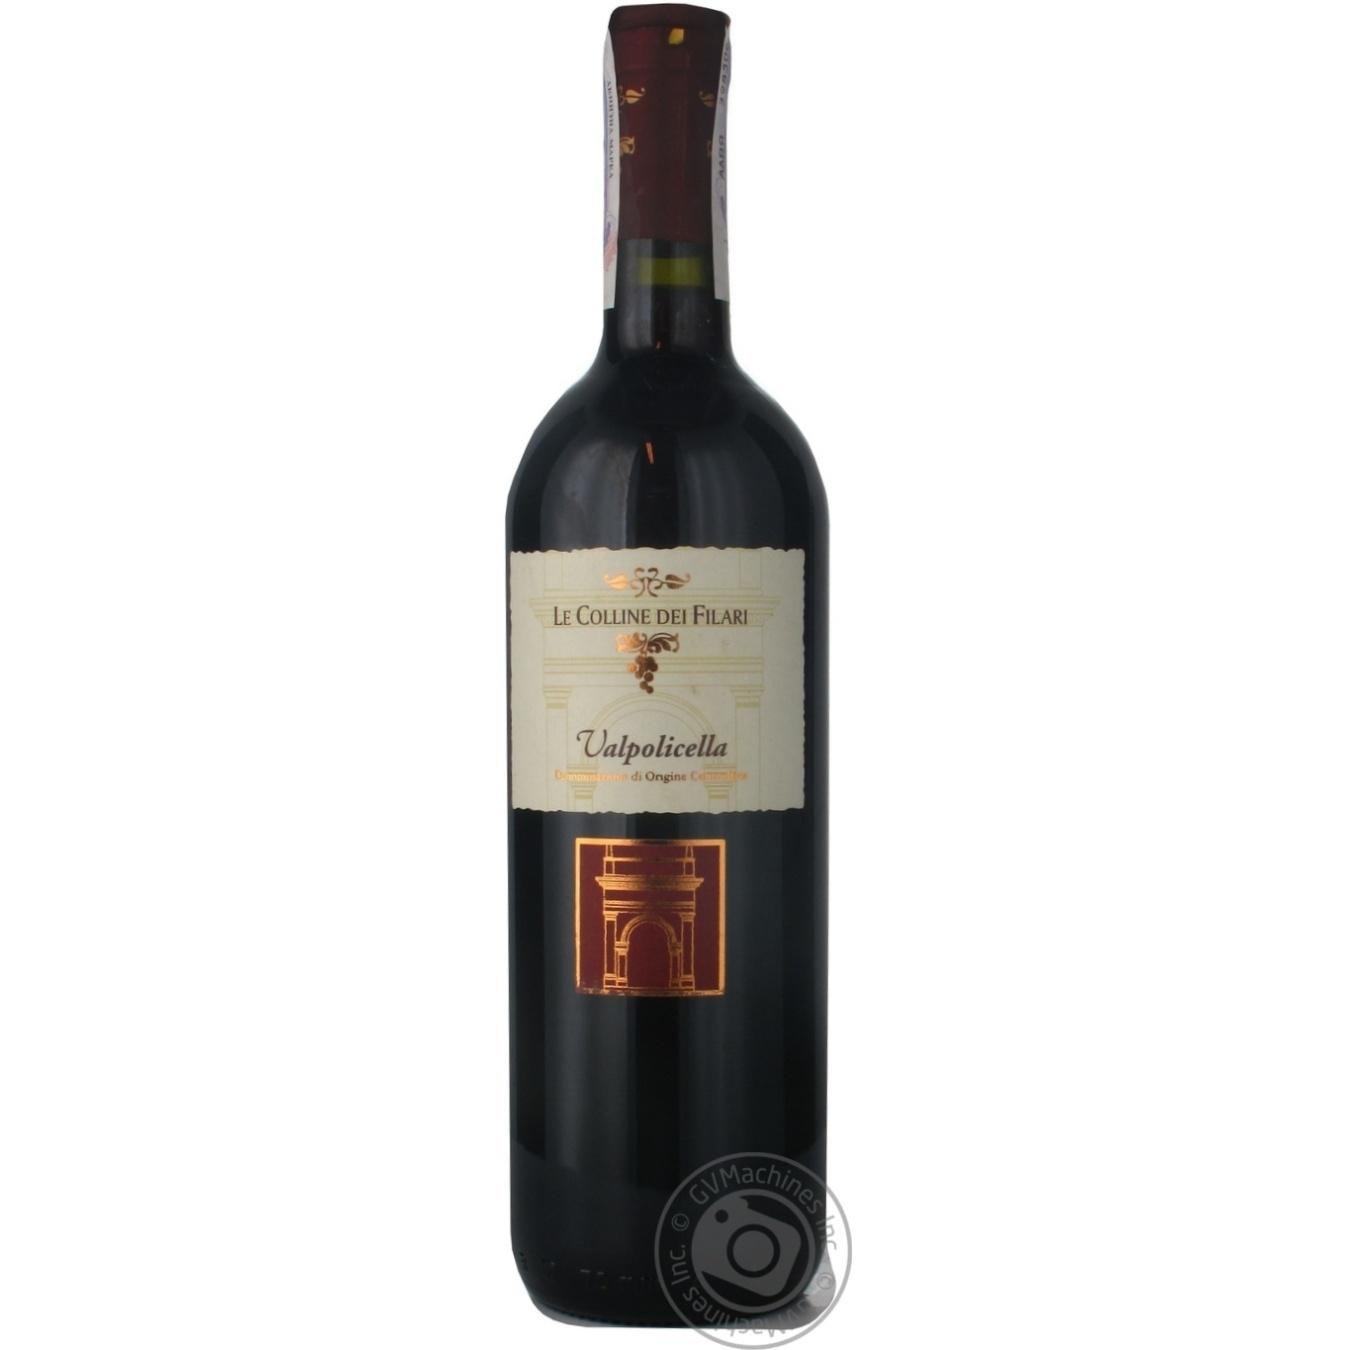 Купить Вино Le Colline dei Filari Valpolicella красное сухое 0, 75л